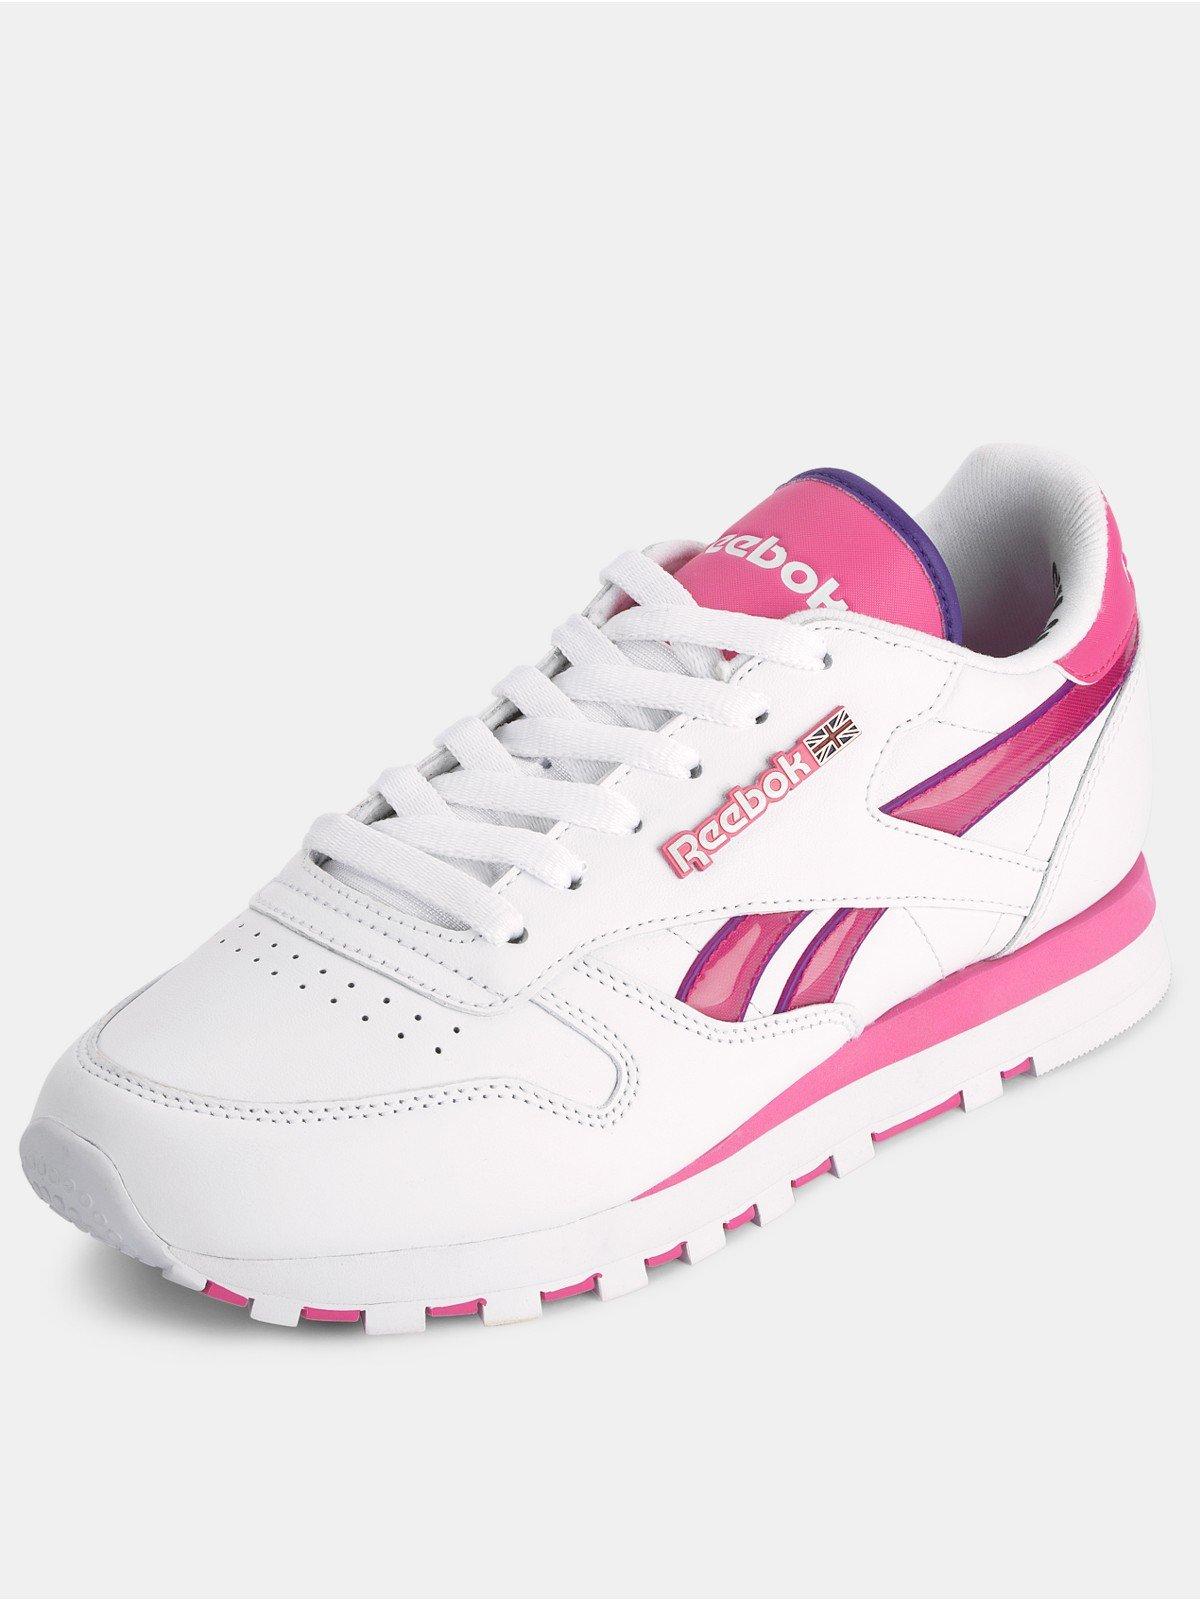 Reebok Pink And White ireferyou.co.uk fa6035175e18